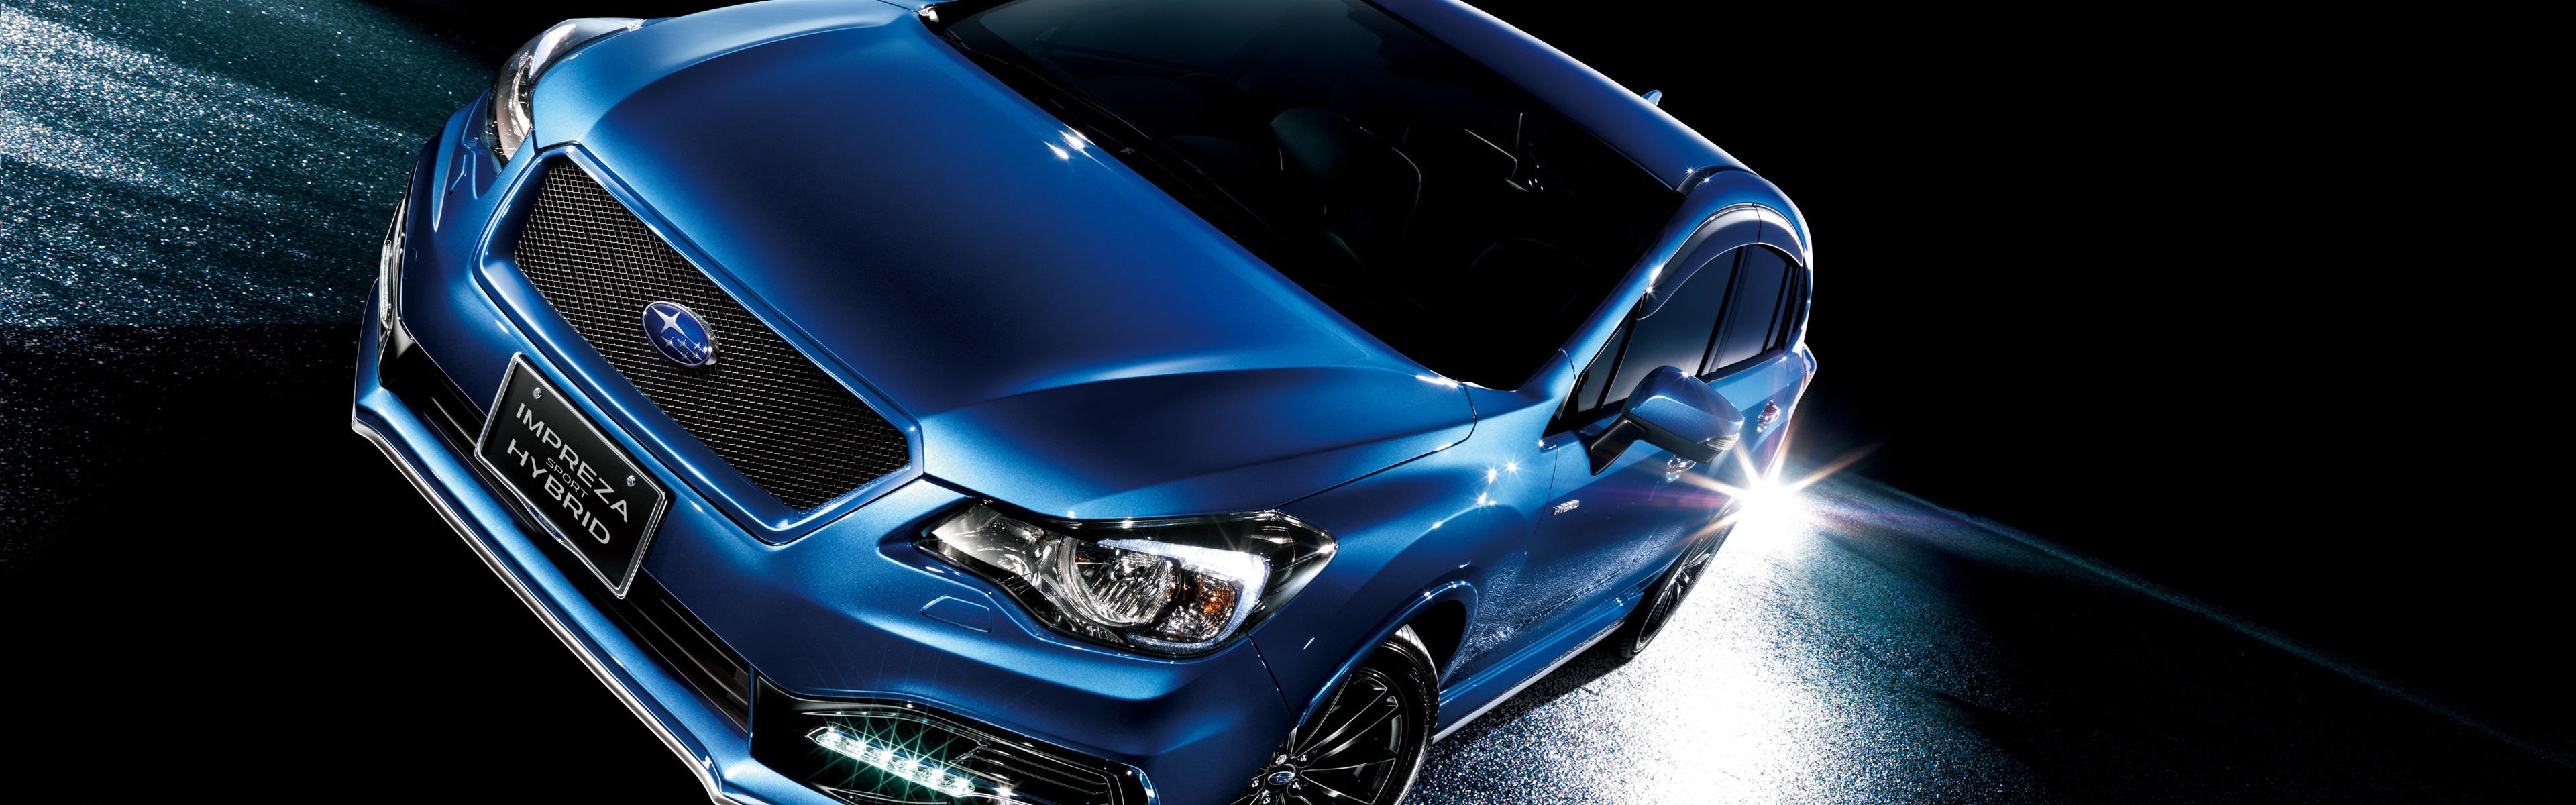 Wallpaper Subaru Impreza sport hybrid blue car at night